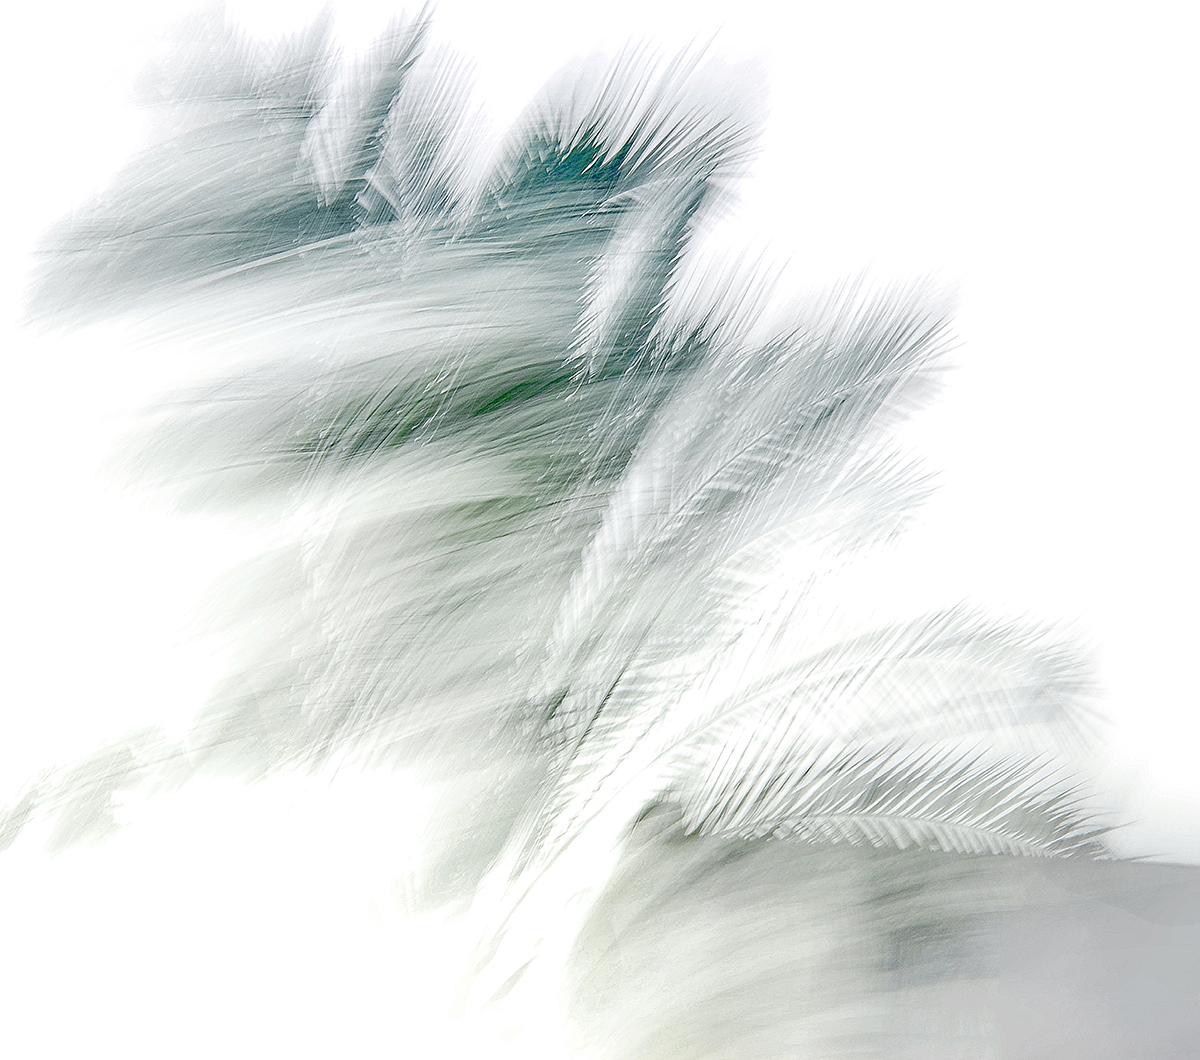 Shifra Levyathan_Windy day.jpg